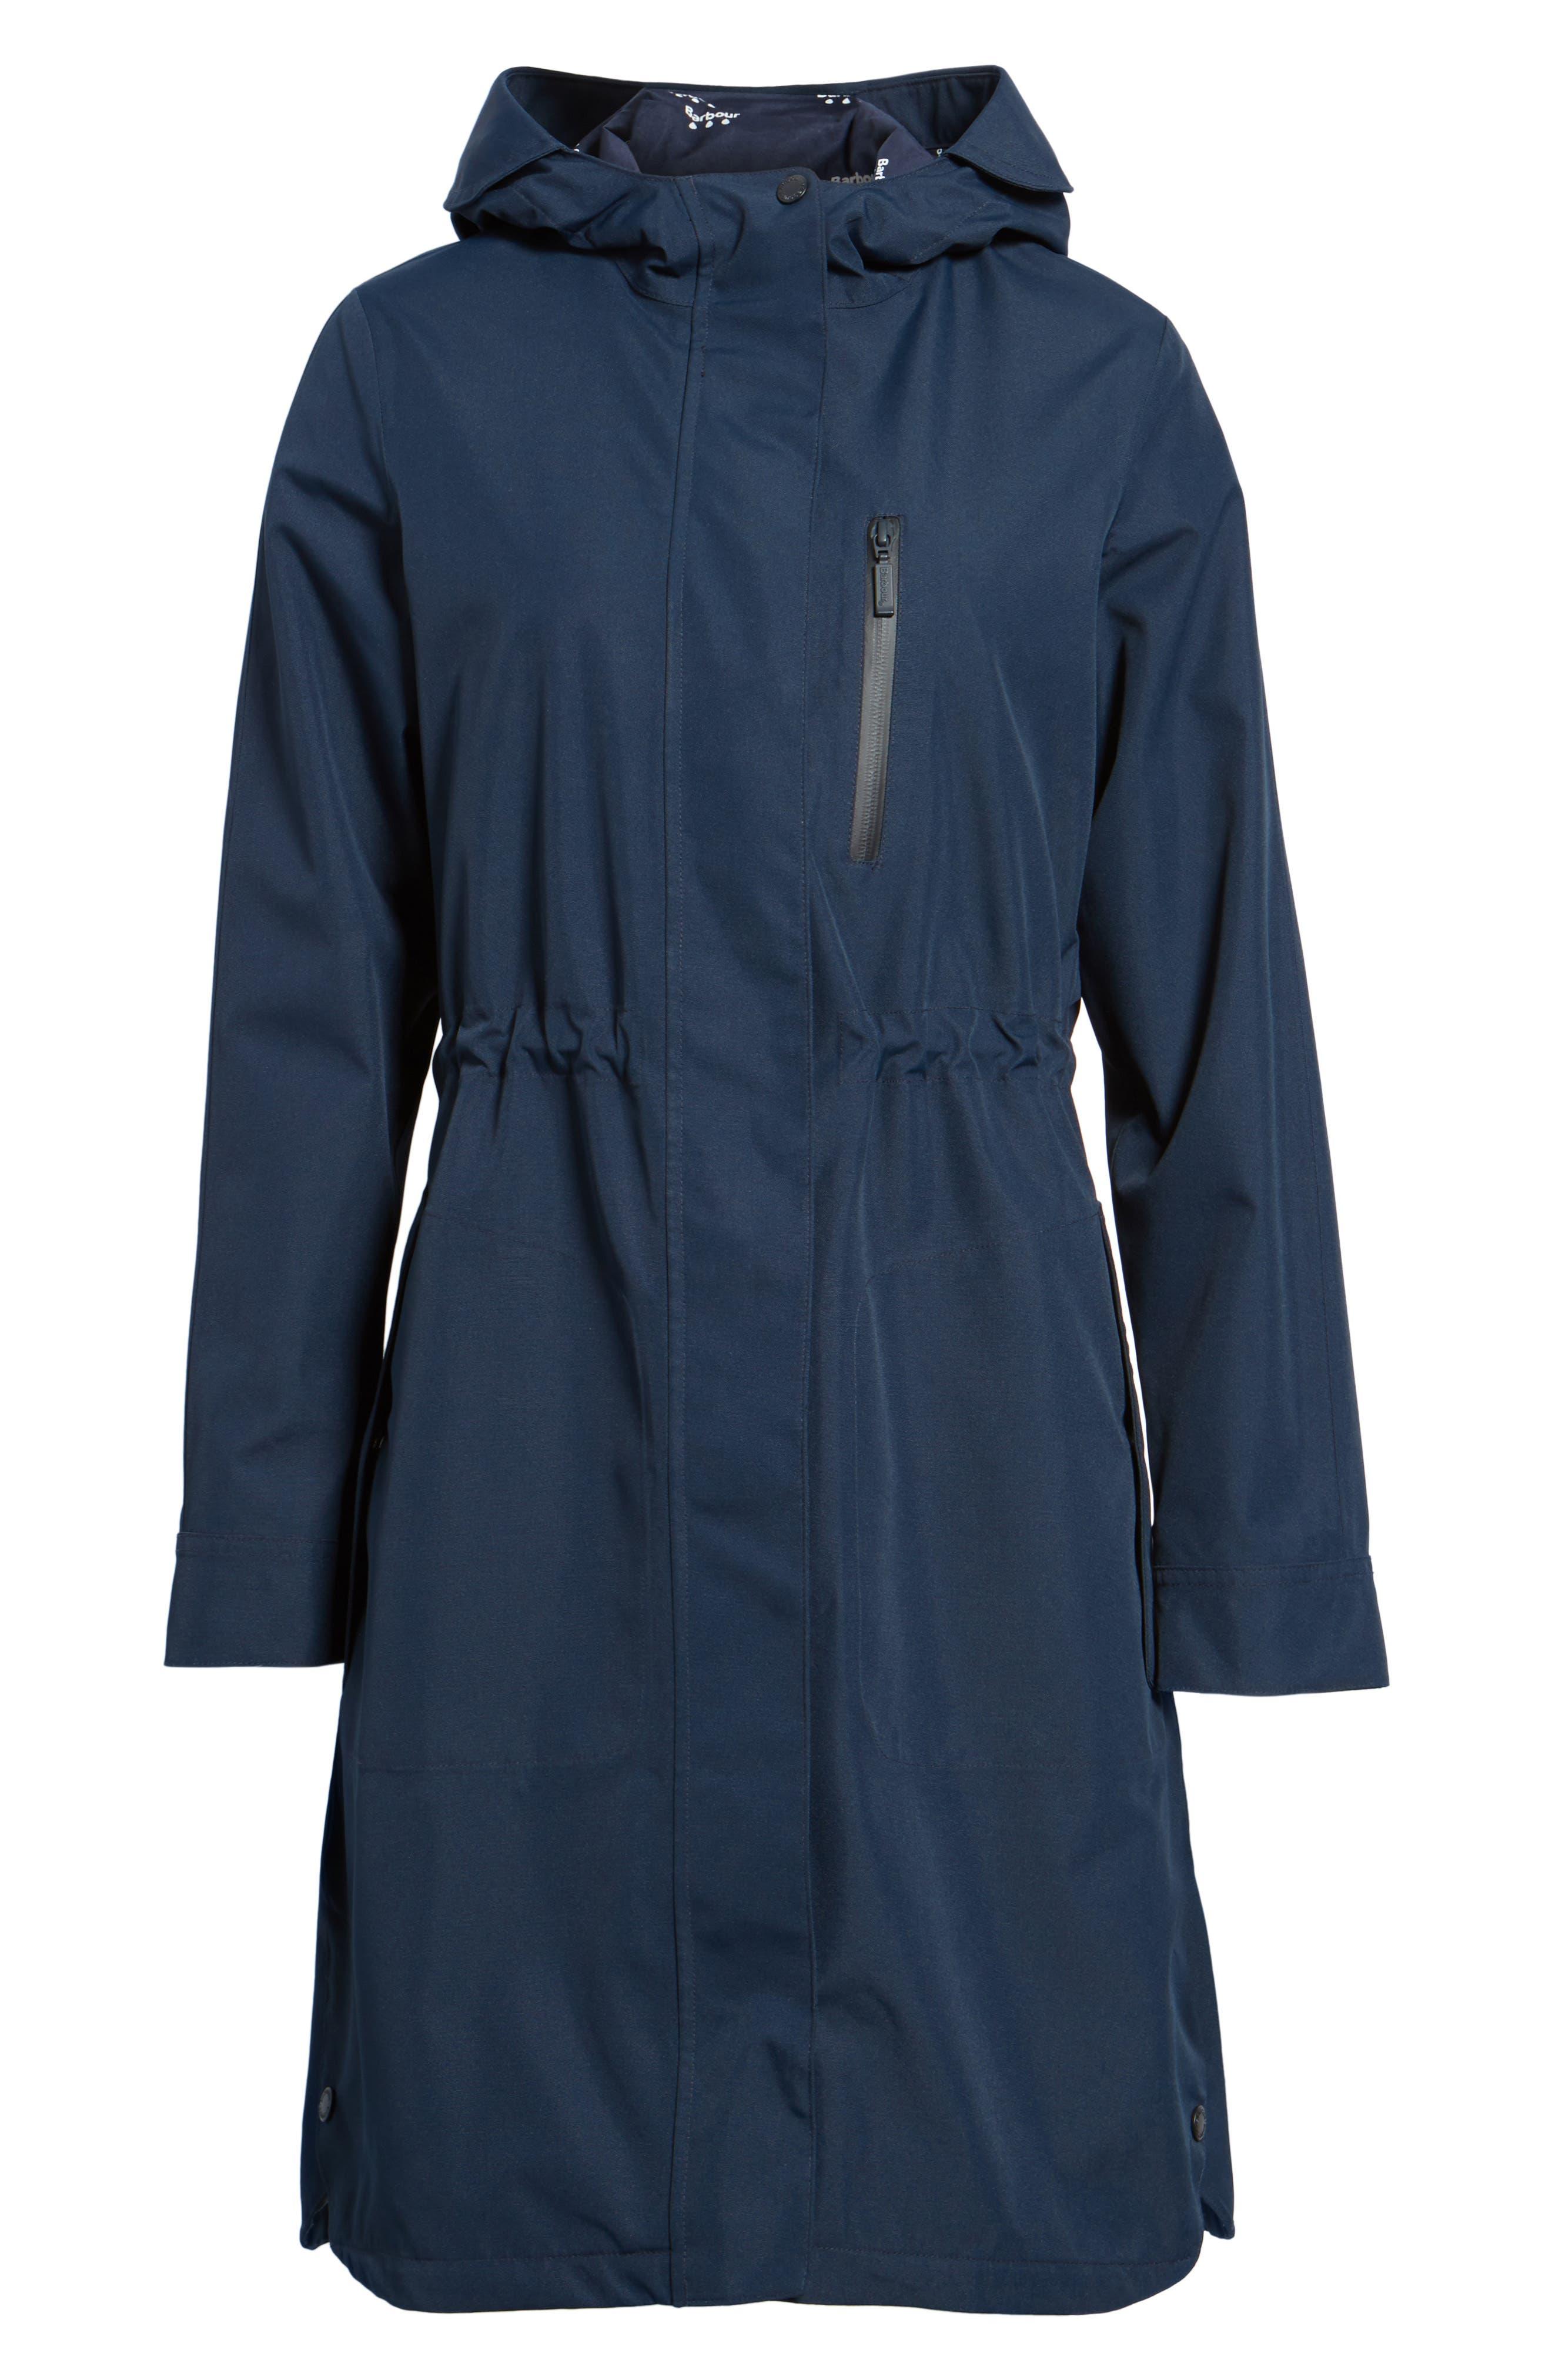 Sleet Hooded Jacket,                             Alternate thumbnail 10, color,